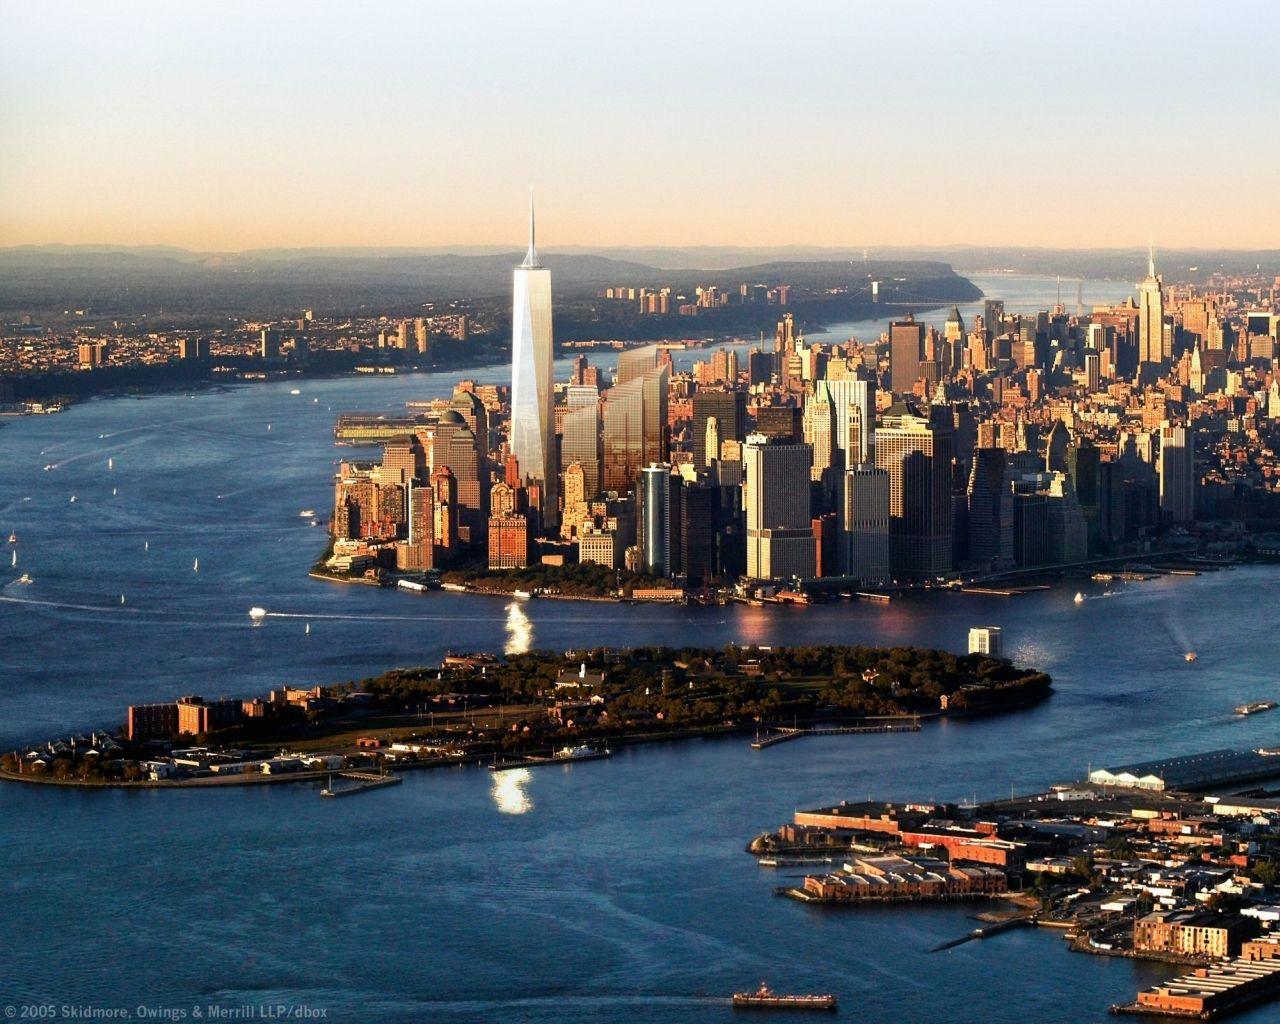 Buildings City Freedom Tower desktop wallpaper nr 38543 1280x1024